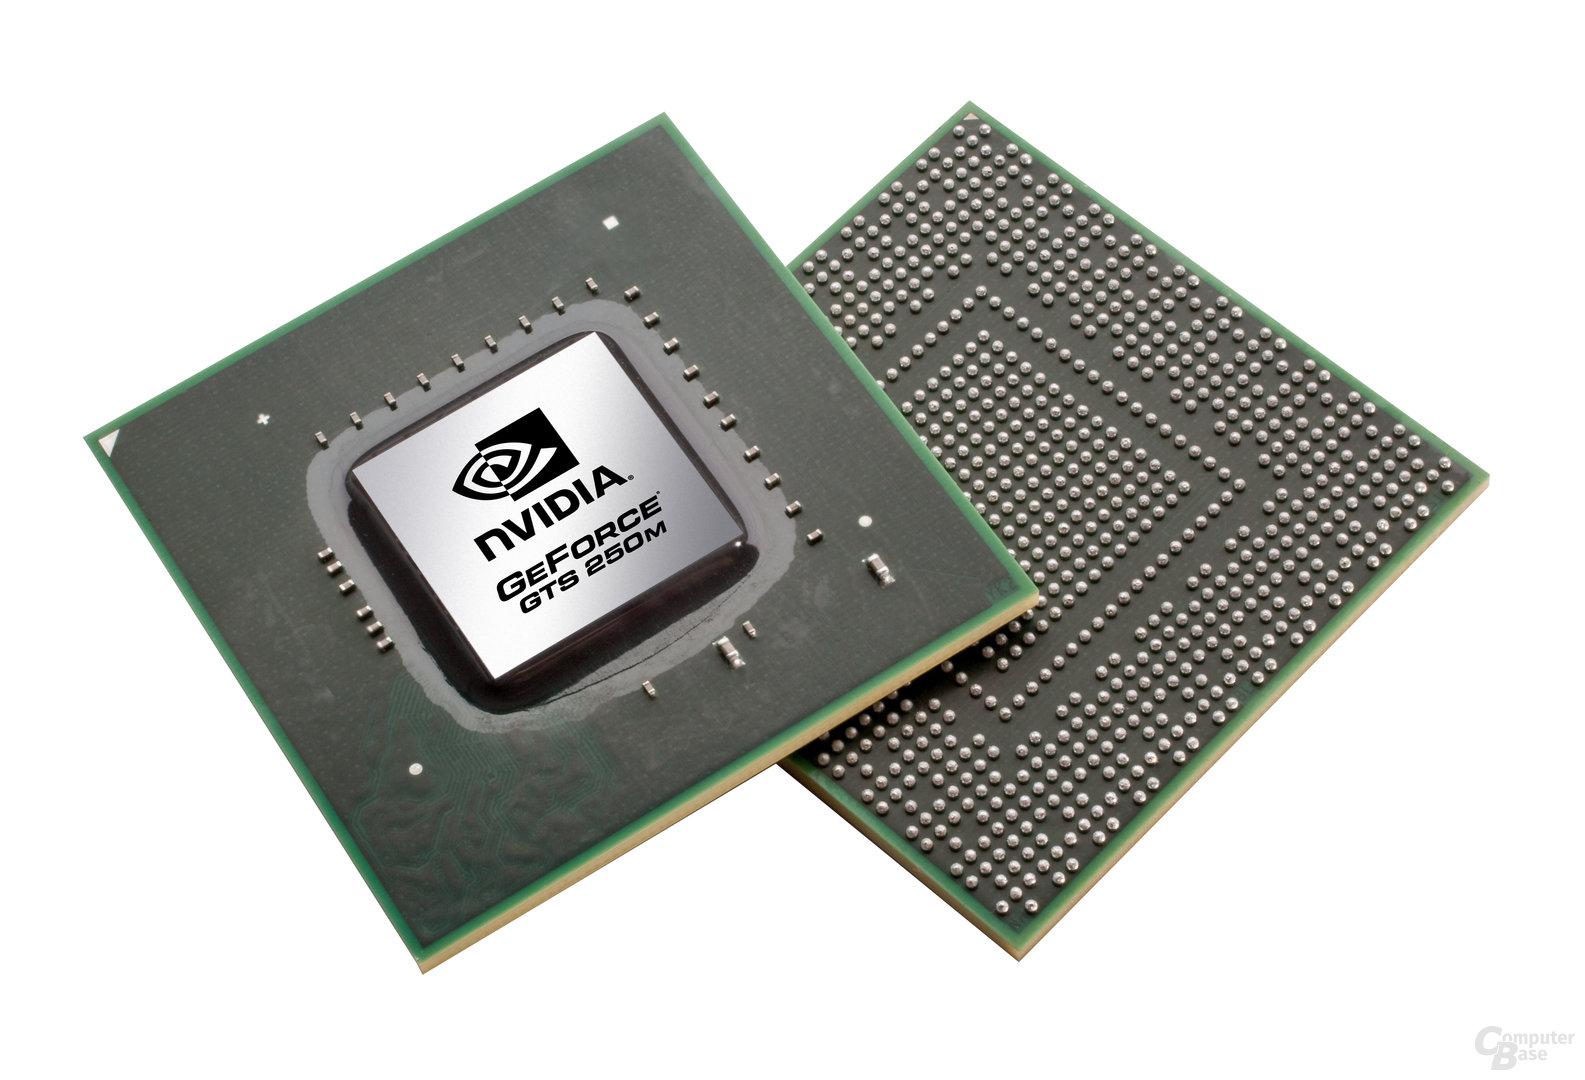 GeForce GTS 250M